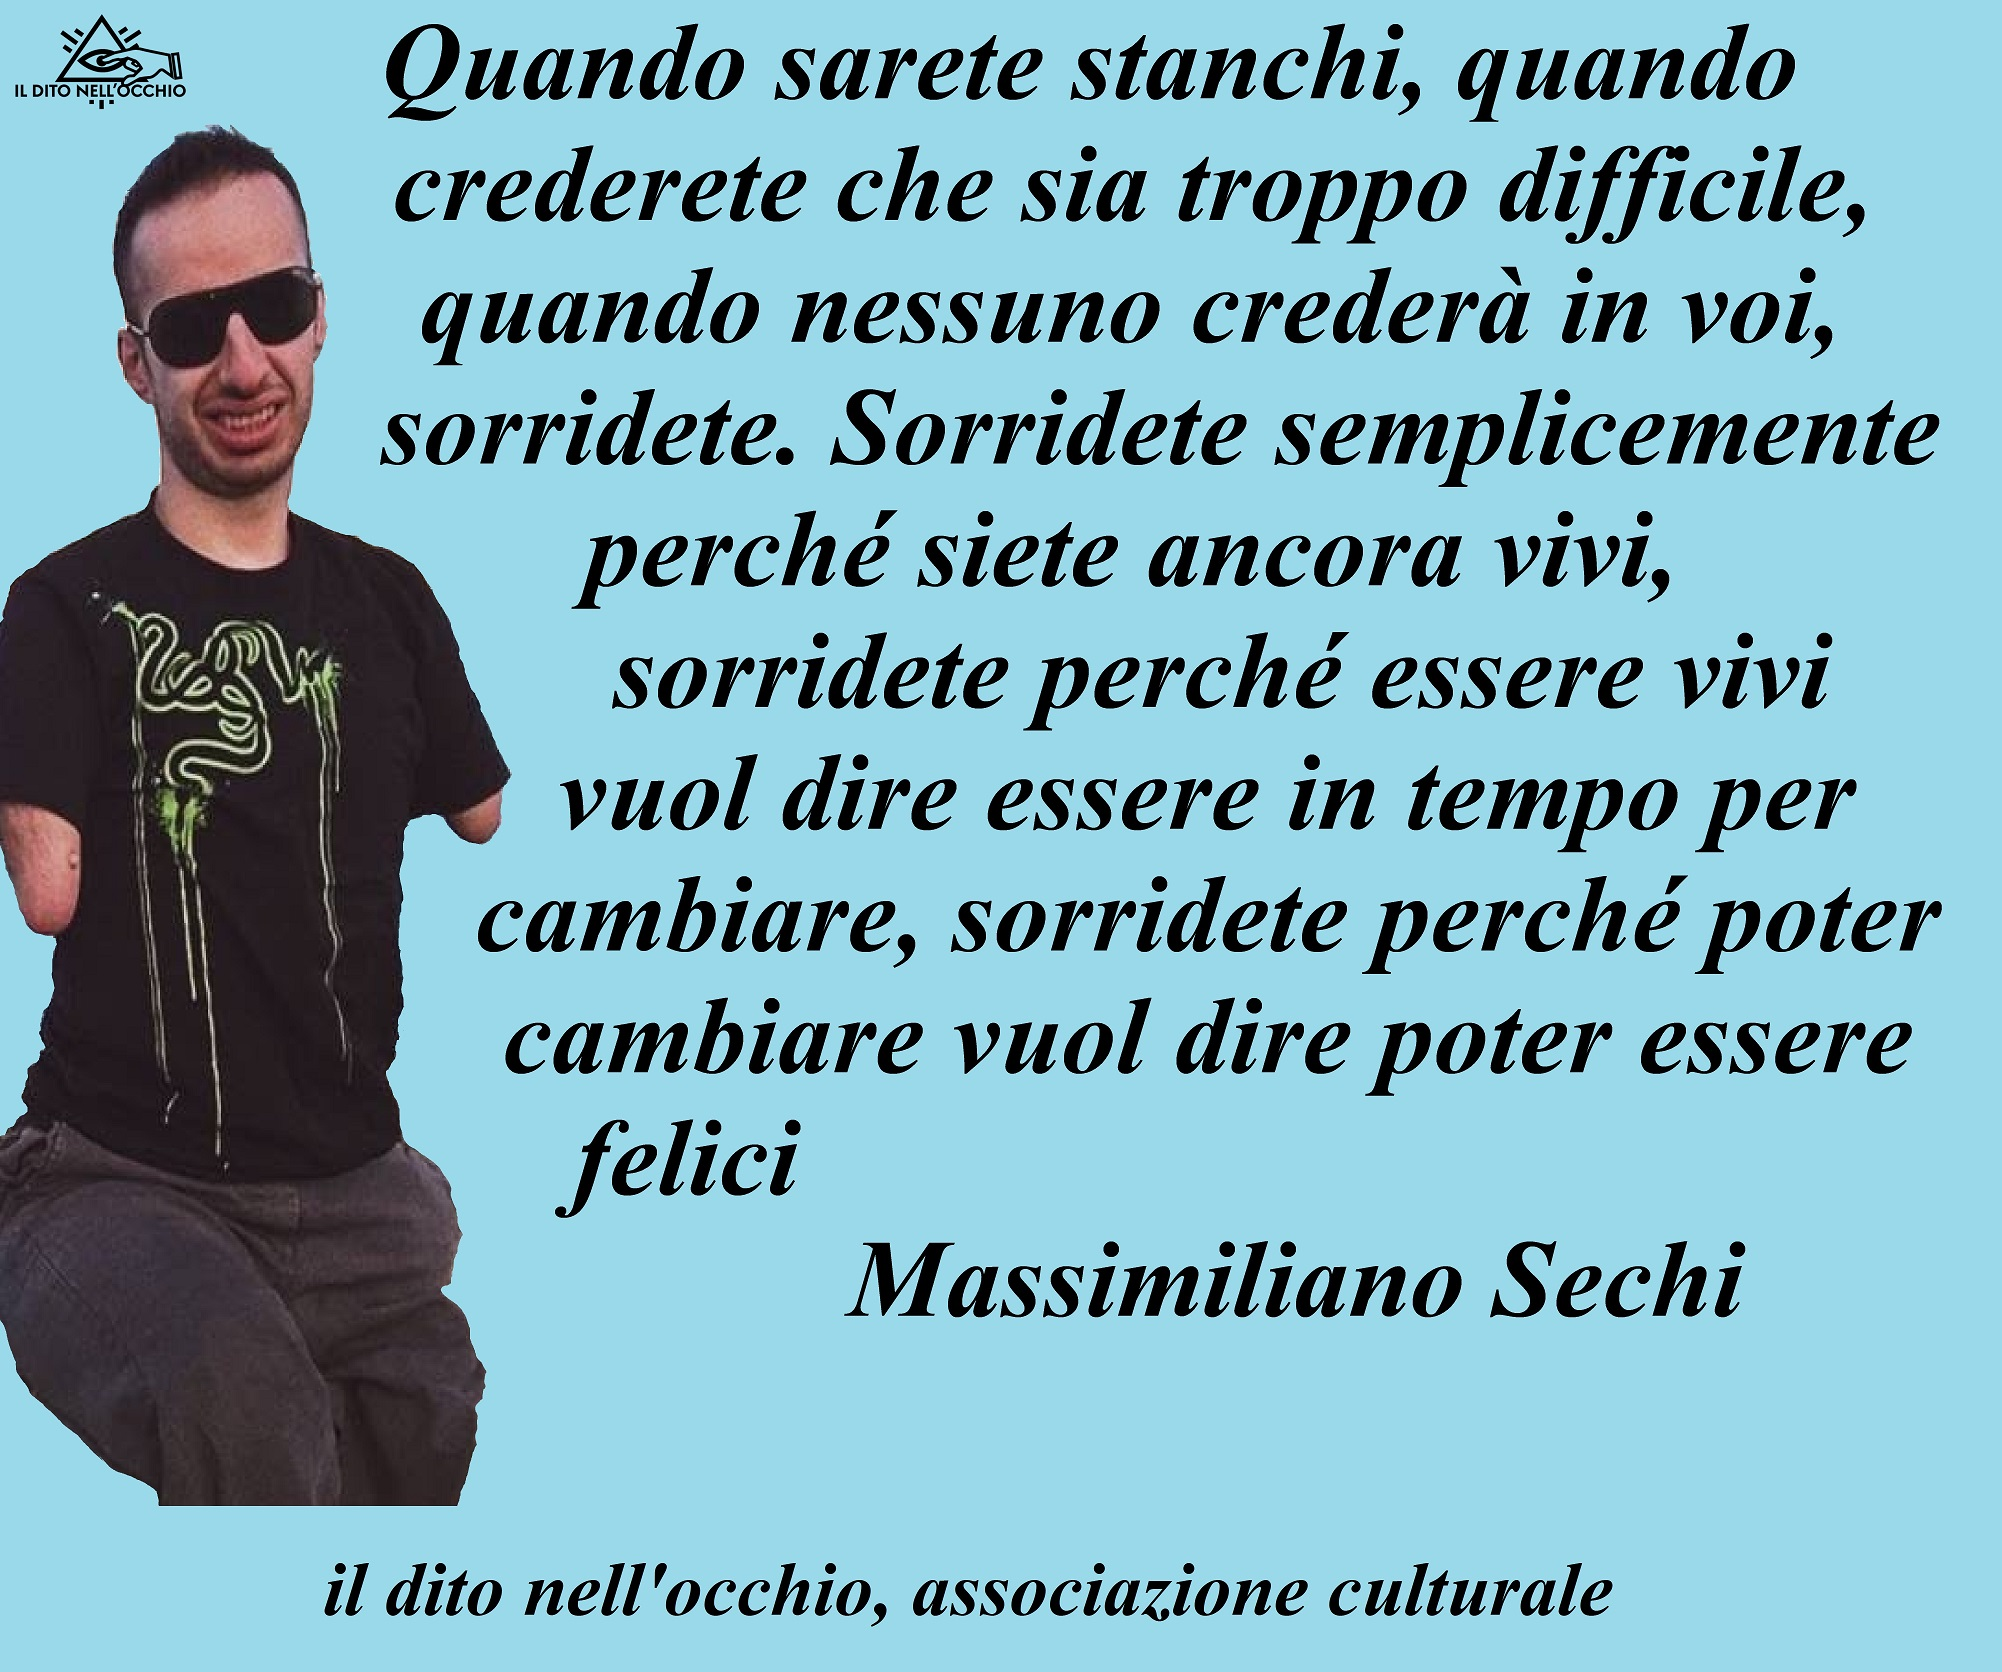 Massimiliano Sechi